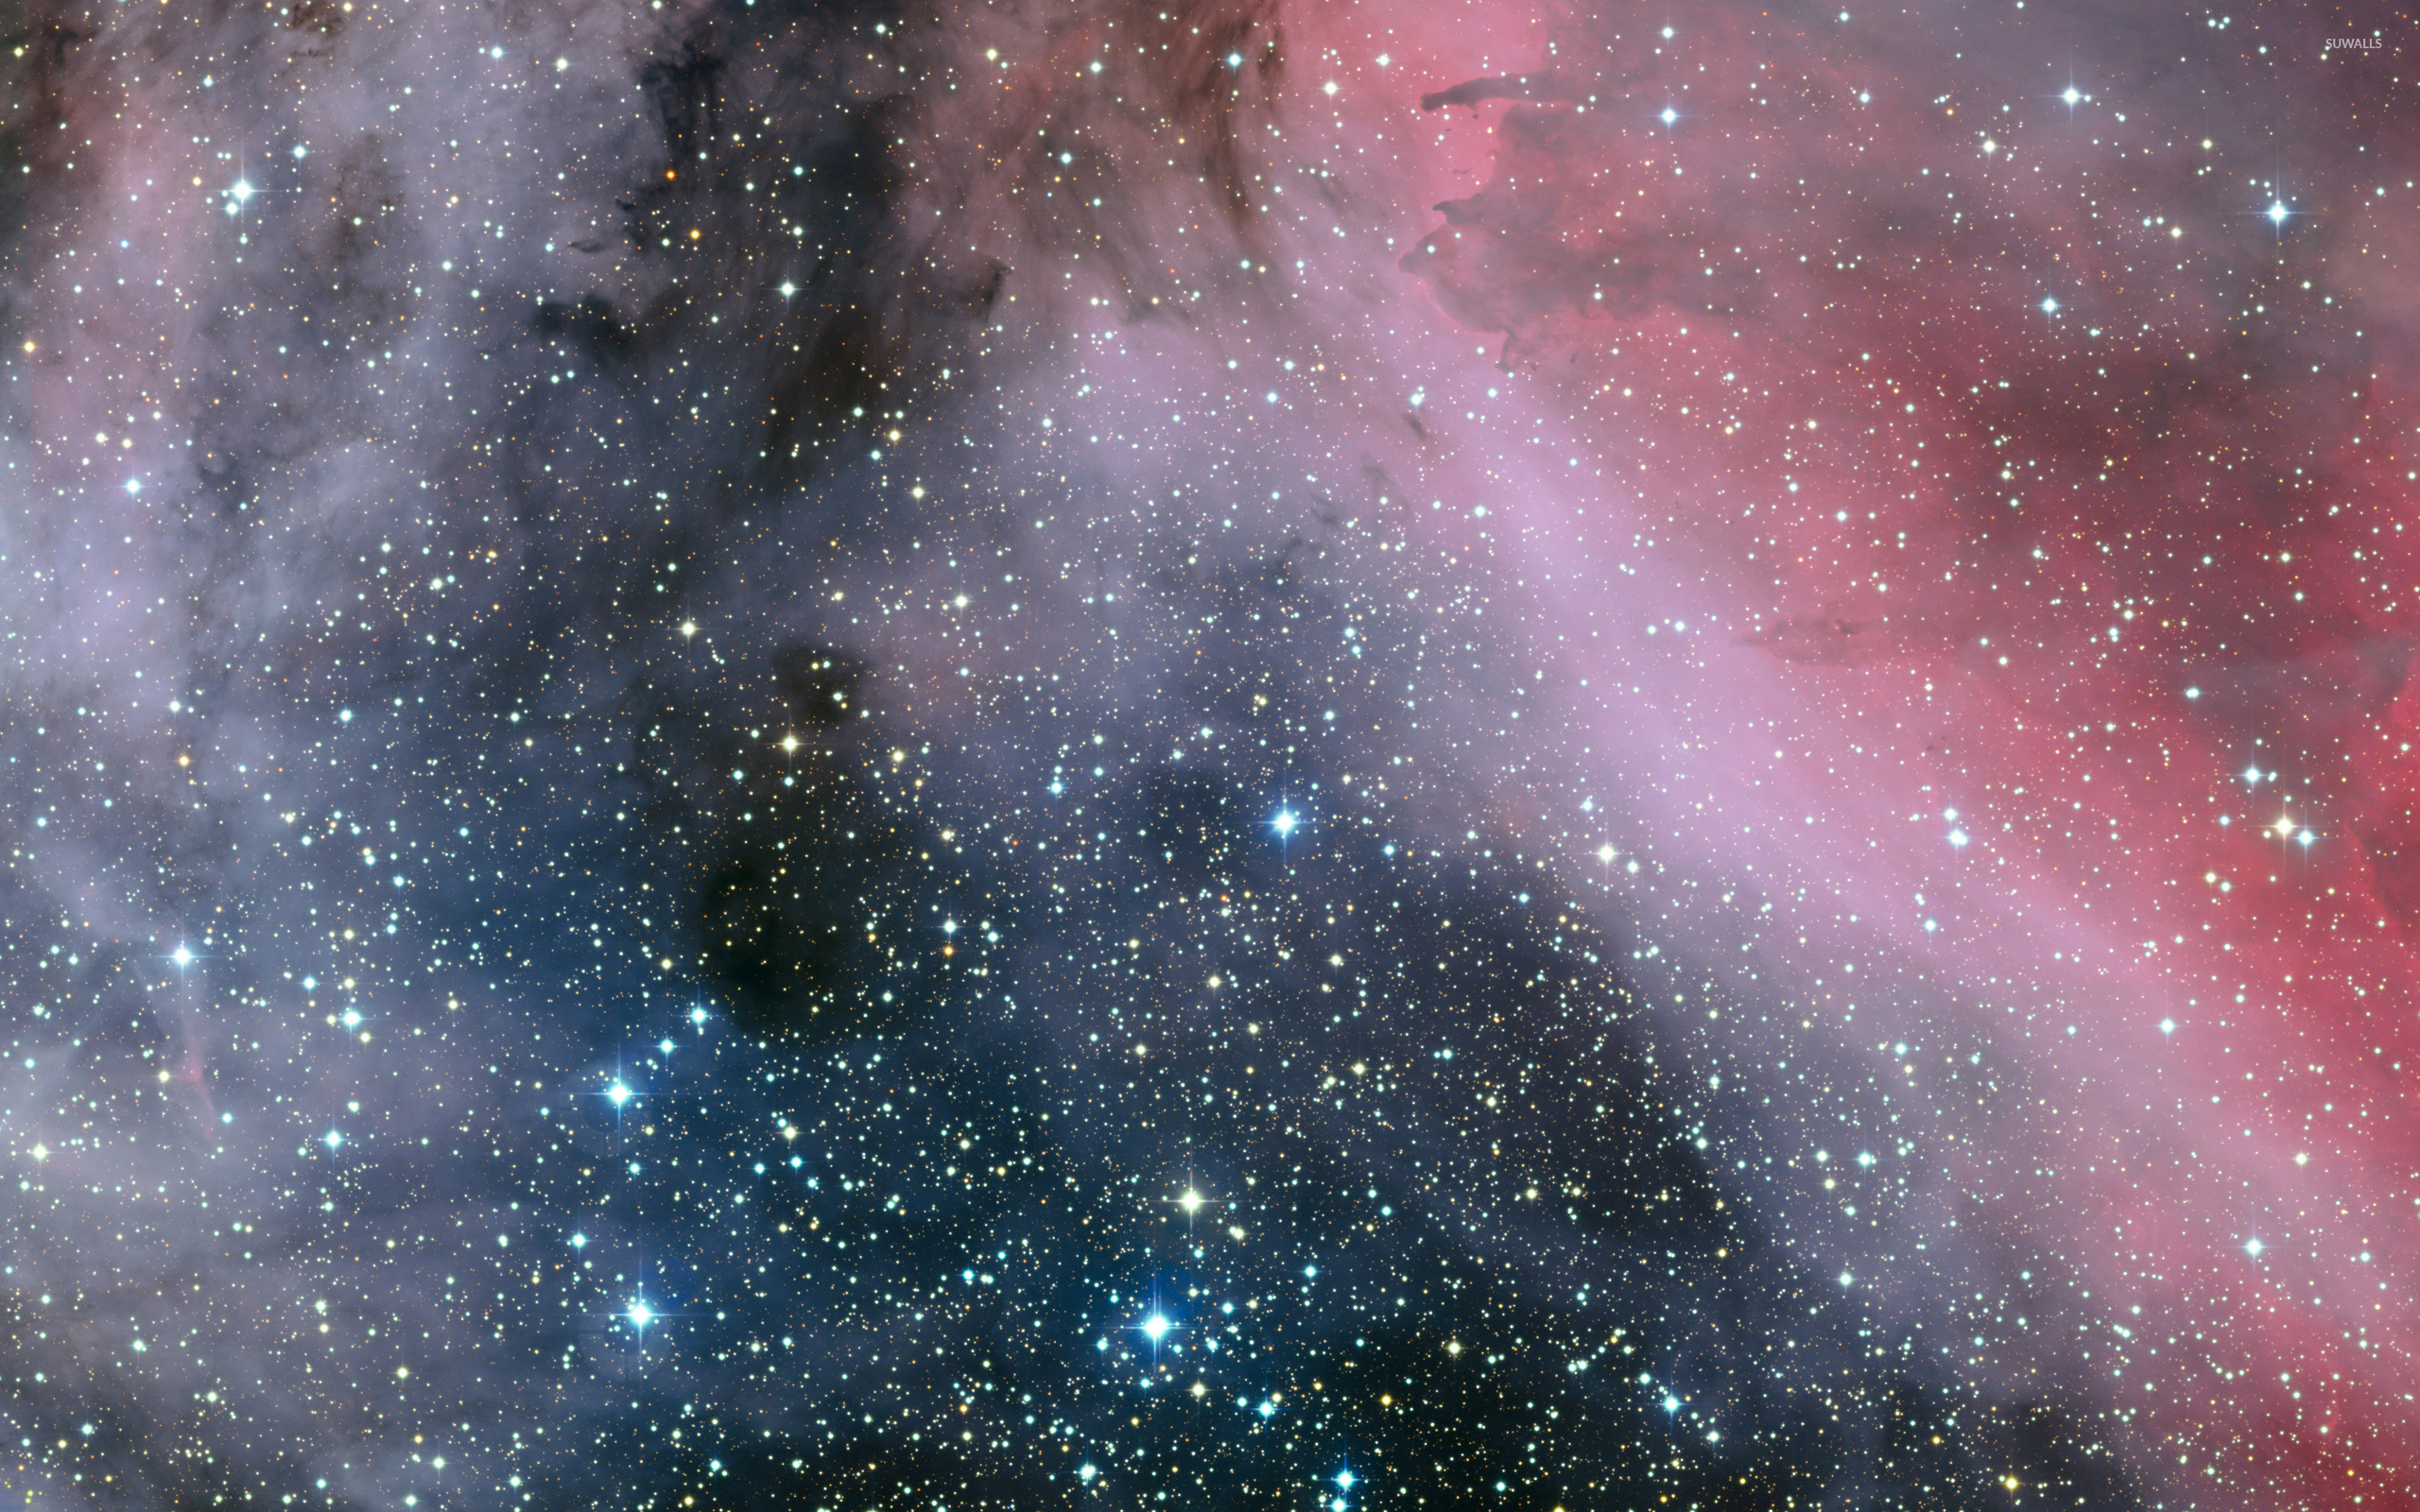 venus wallpaper - space wallpapers - #5803